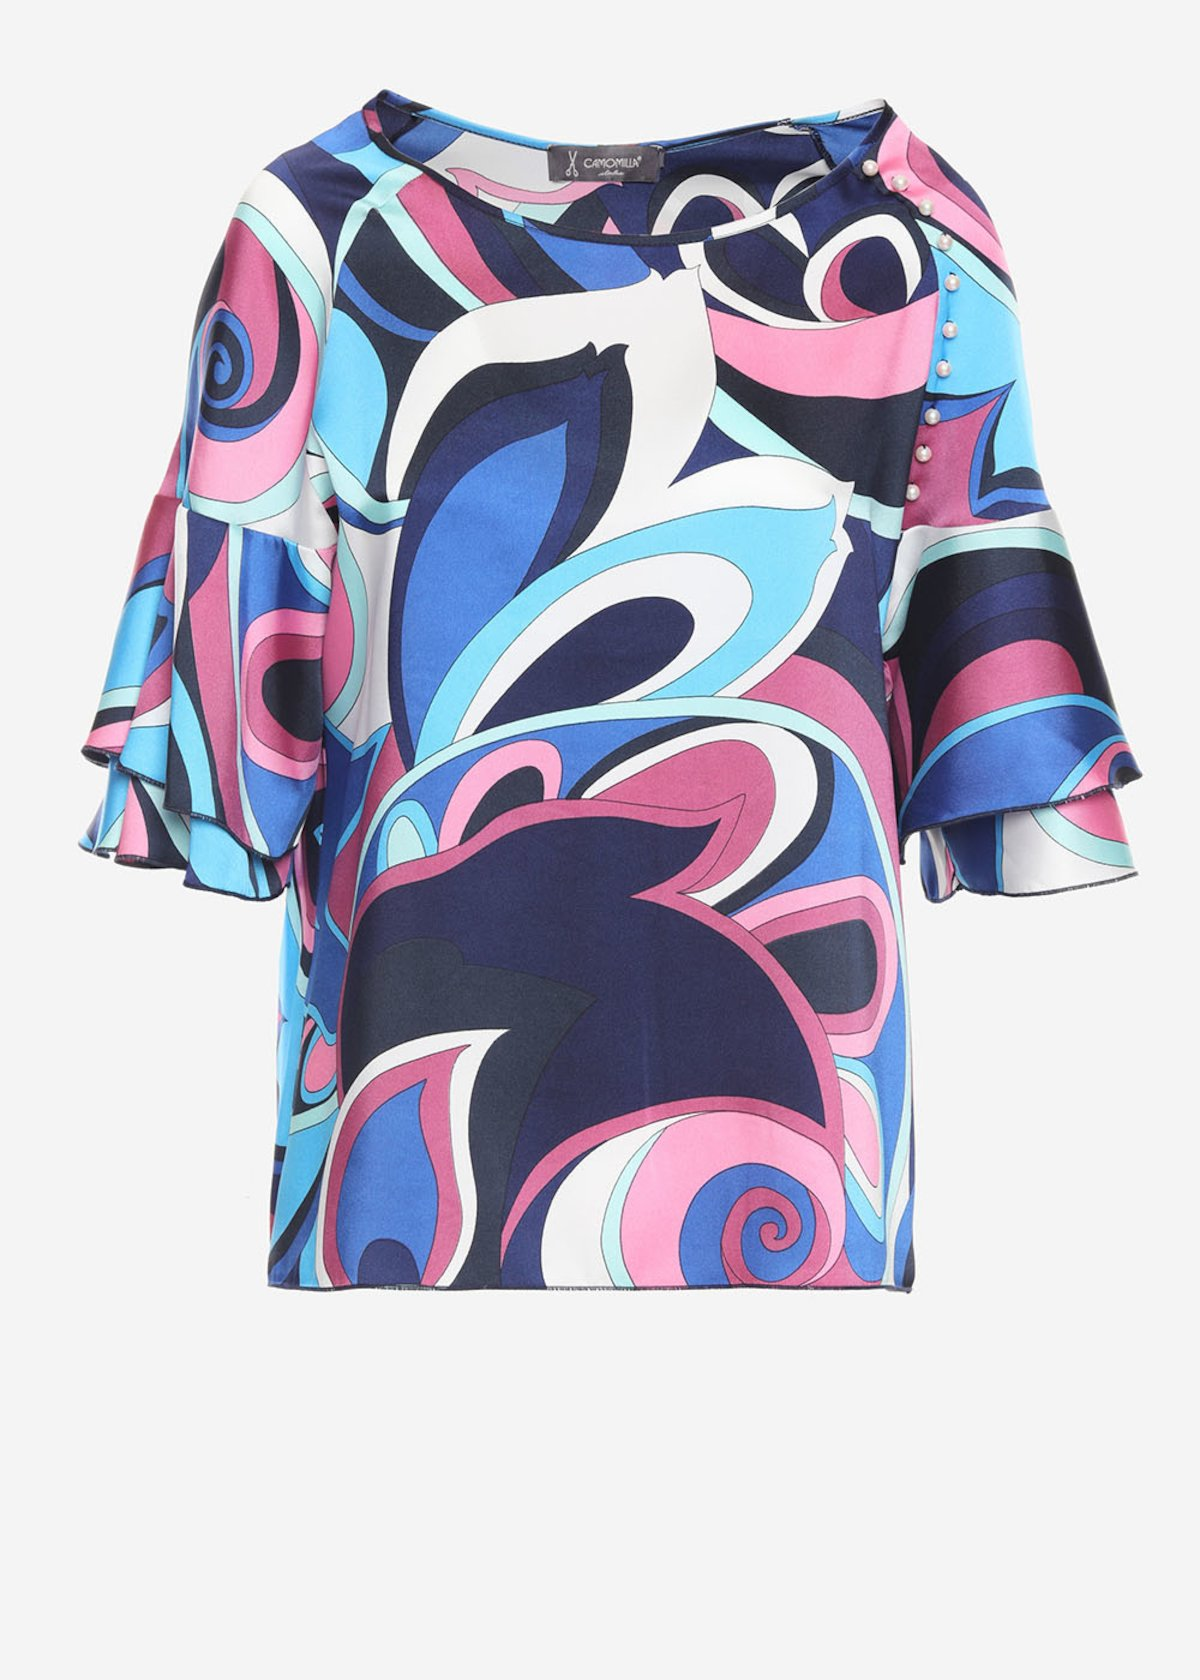 Sofia twill t-shirt with geometric print - Aquarius / Paradise Fantasia